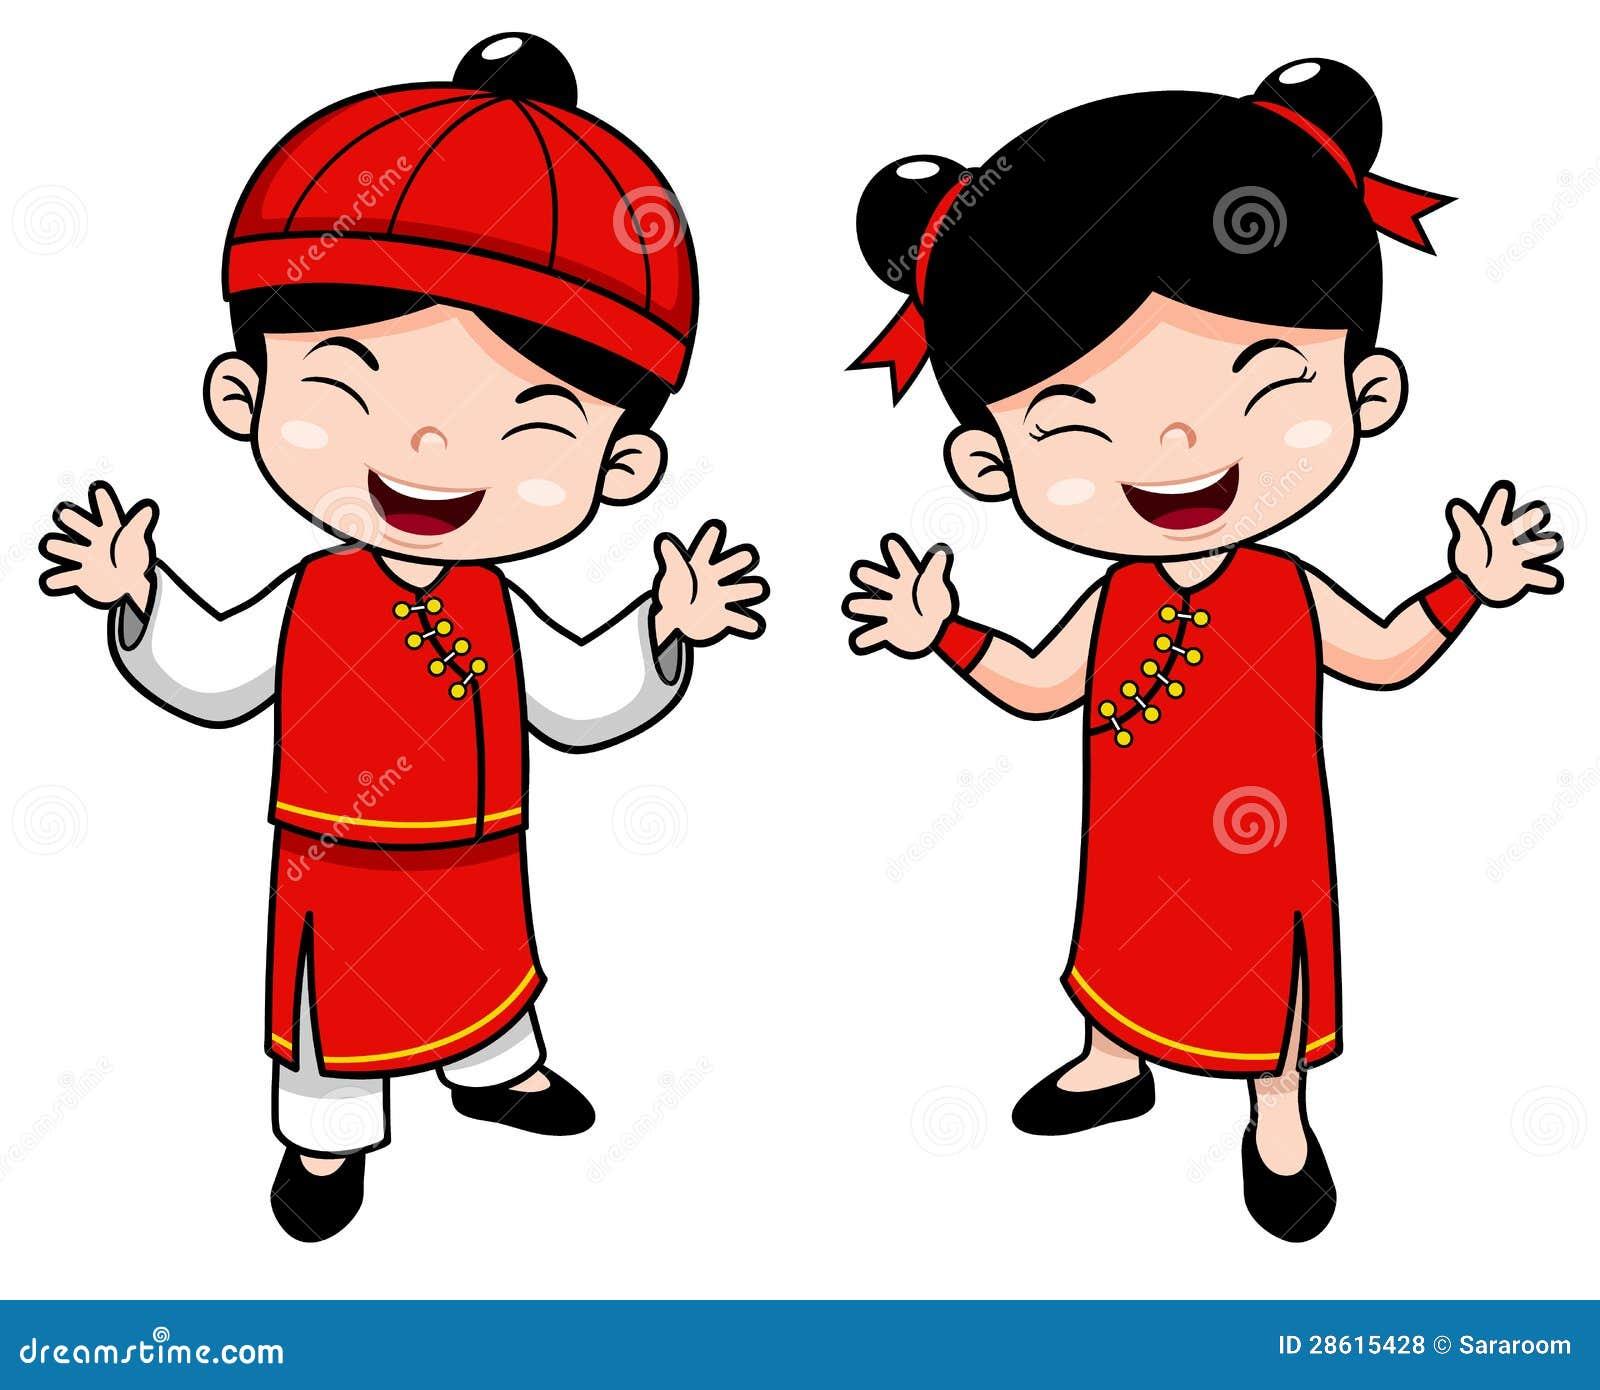 Cartoon Chinese Kids Royalty Free Stock Photos - Image: 28615428